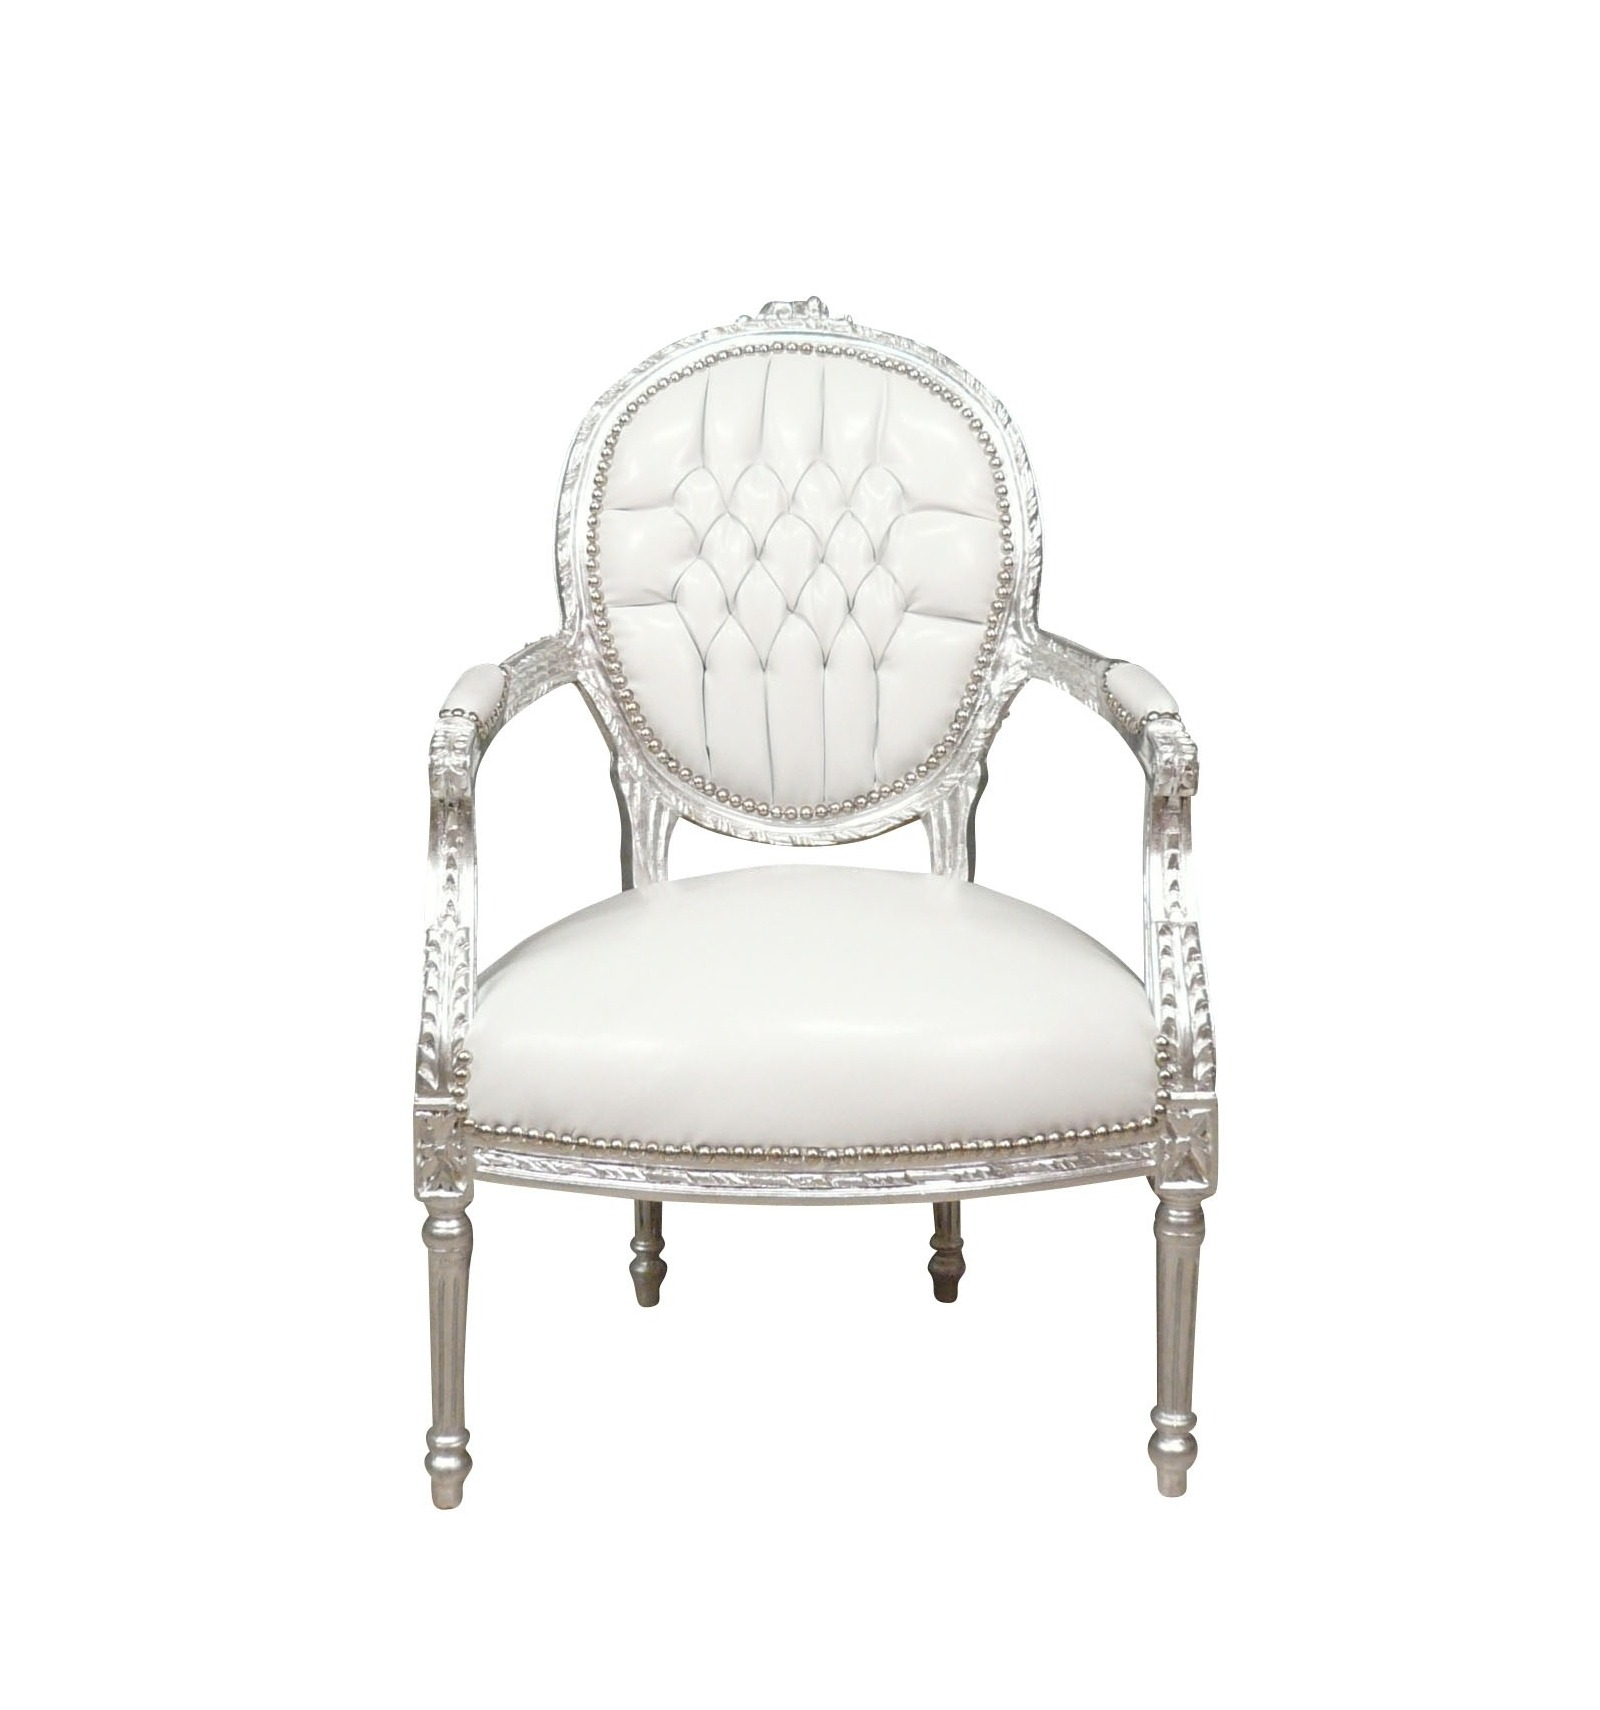 Sessel barock weiß im Louis XVI Sessel Louis XVI stil alten